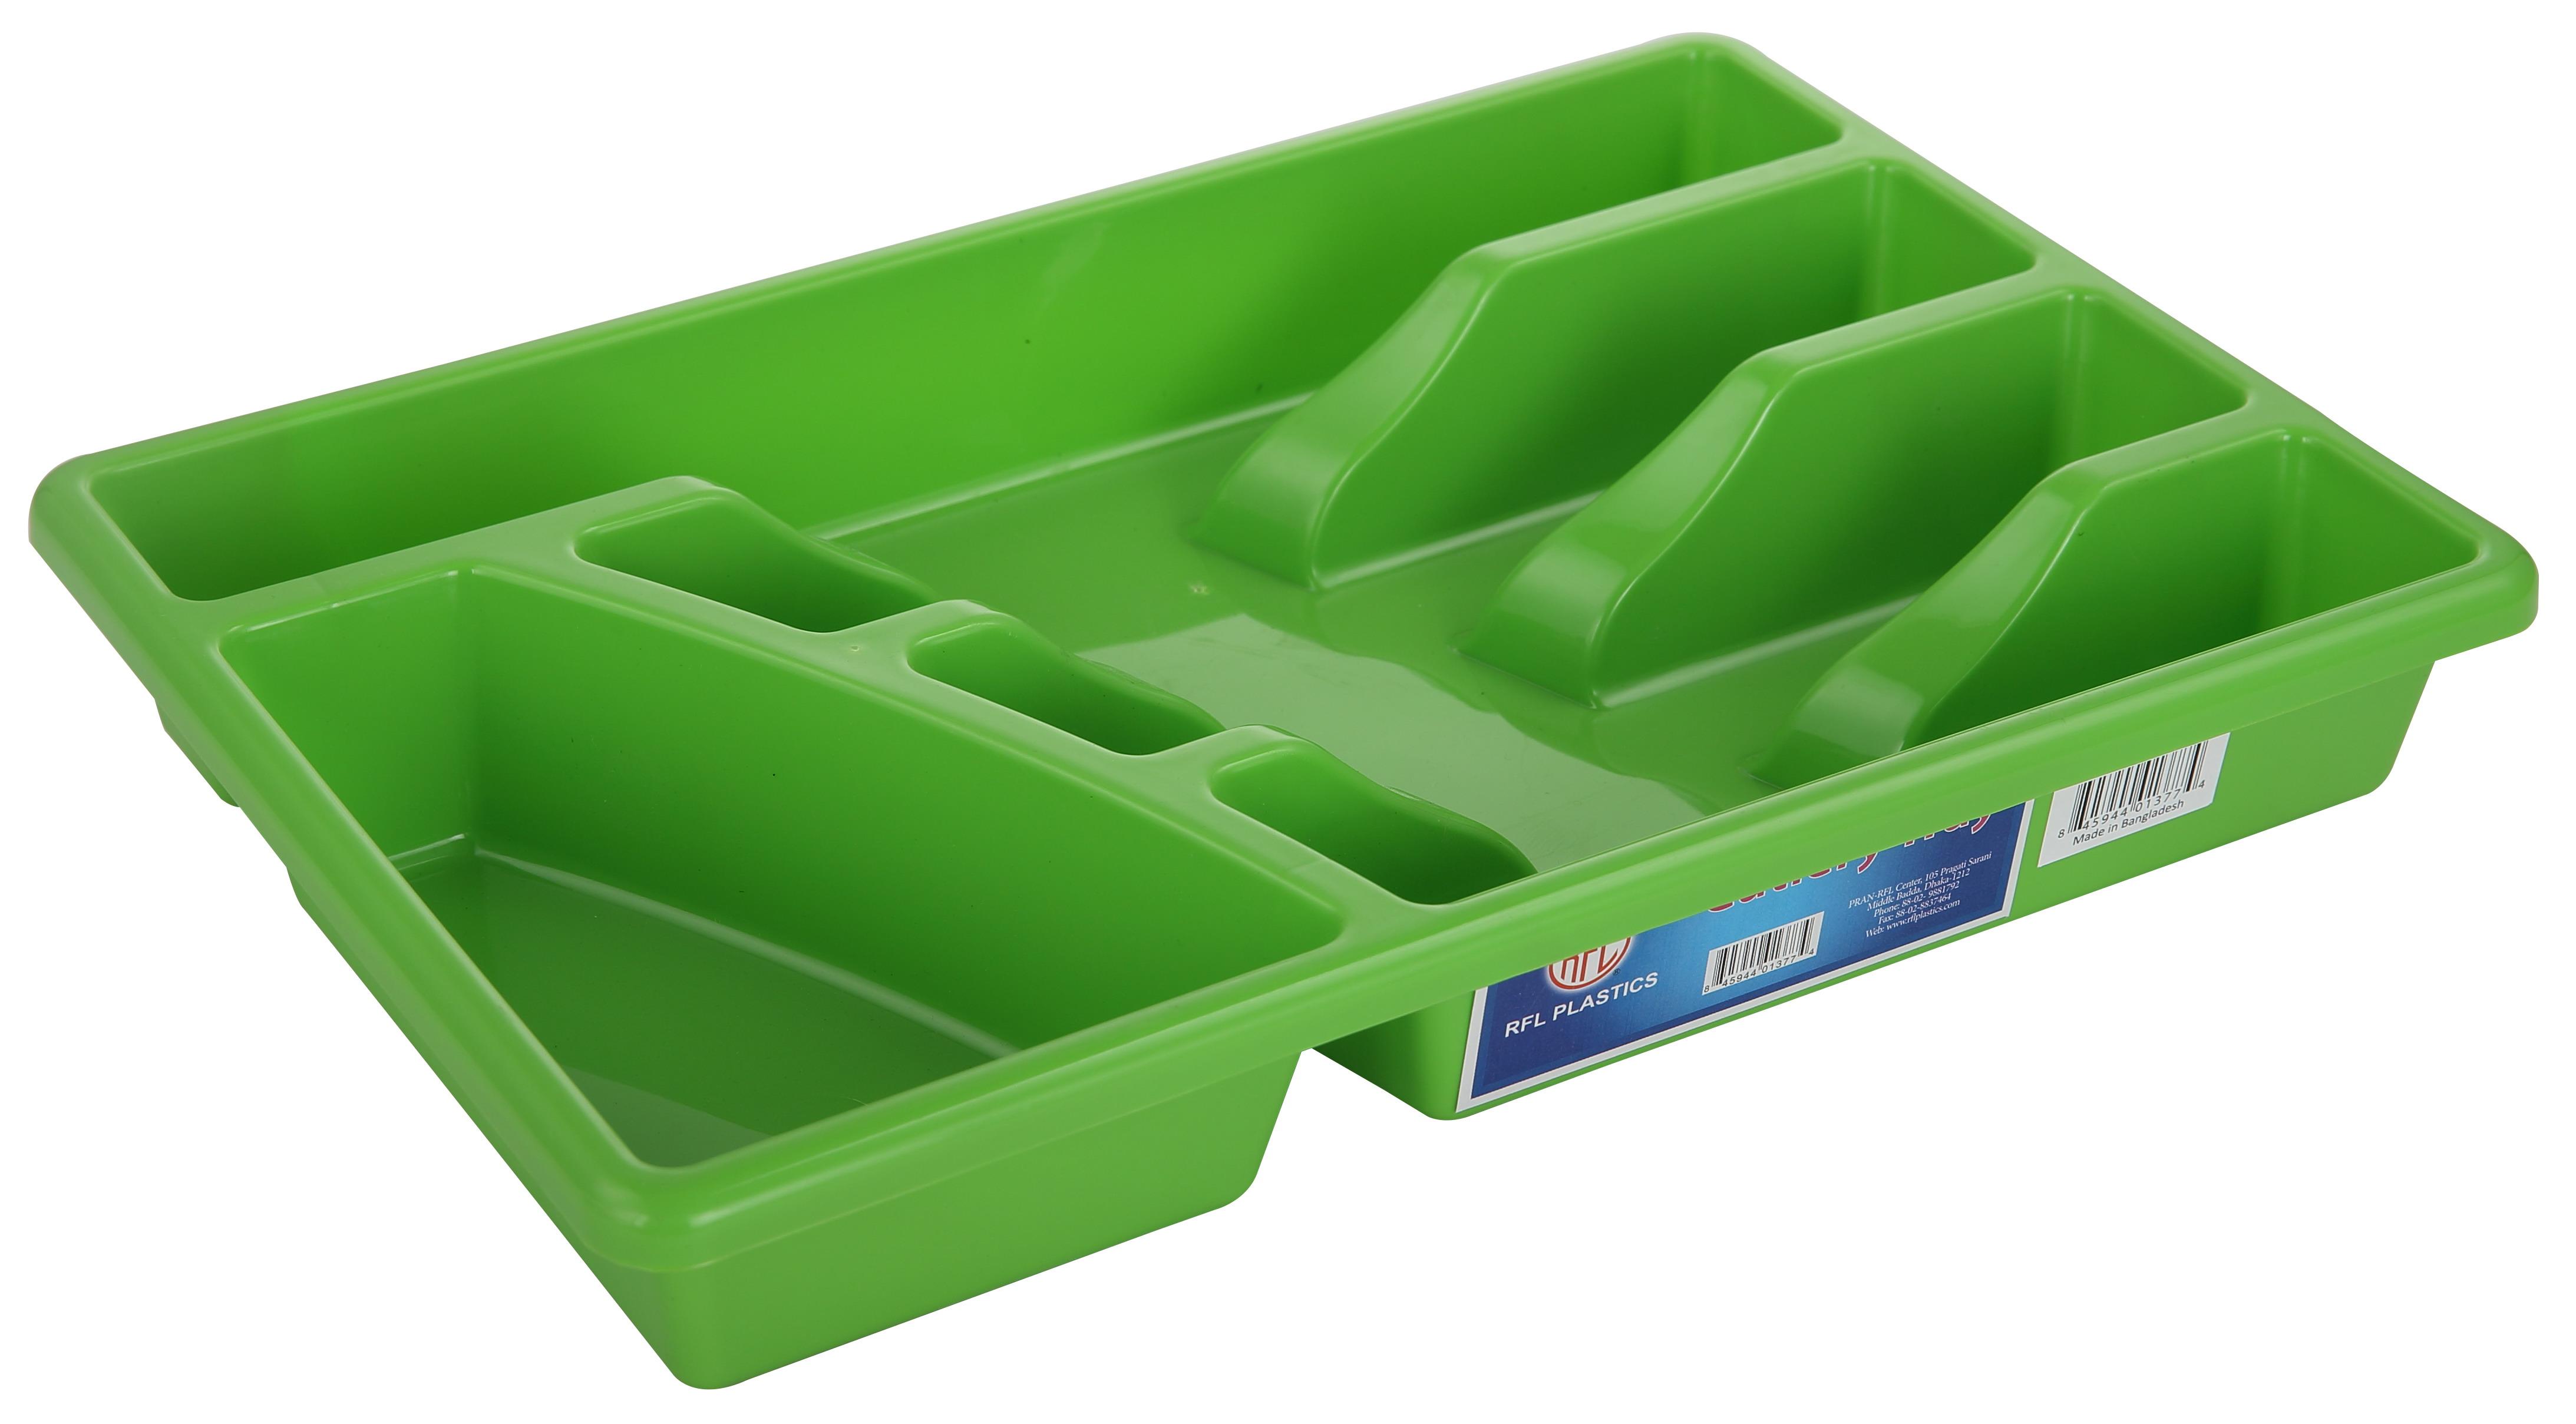 RFL Plastics: Buy RFL Plastic Products in Bangladesh